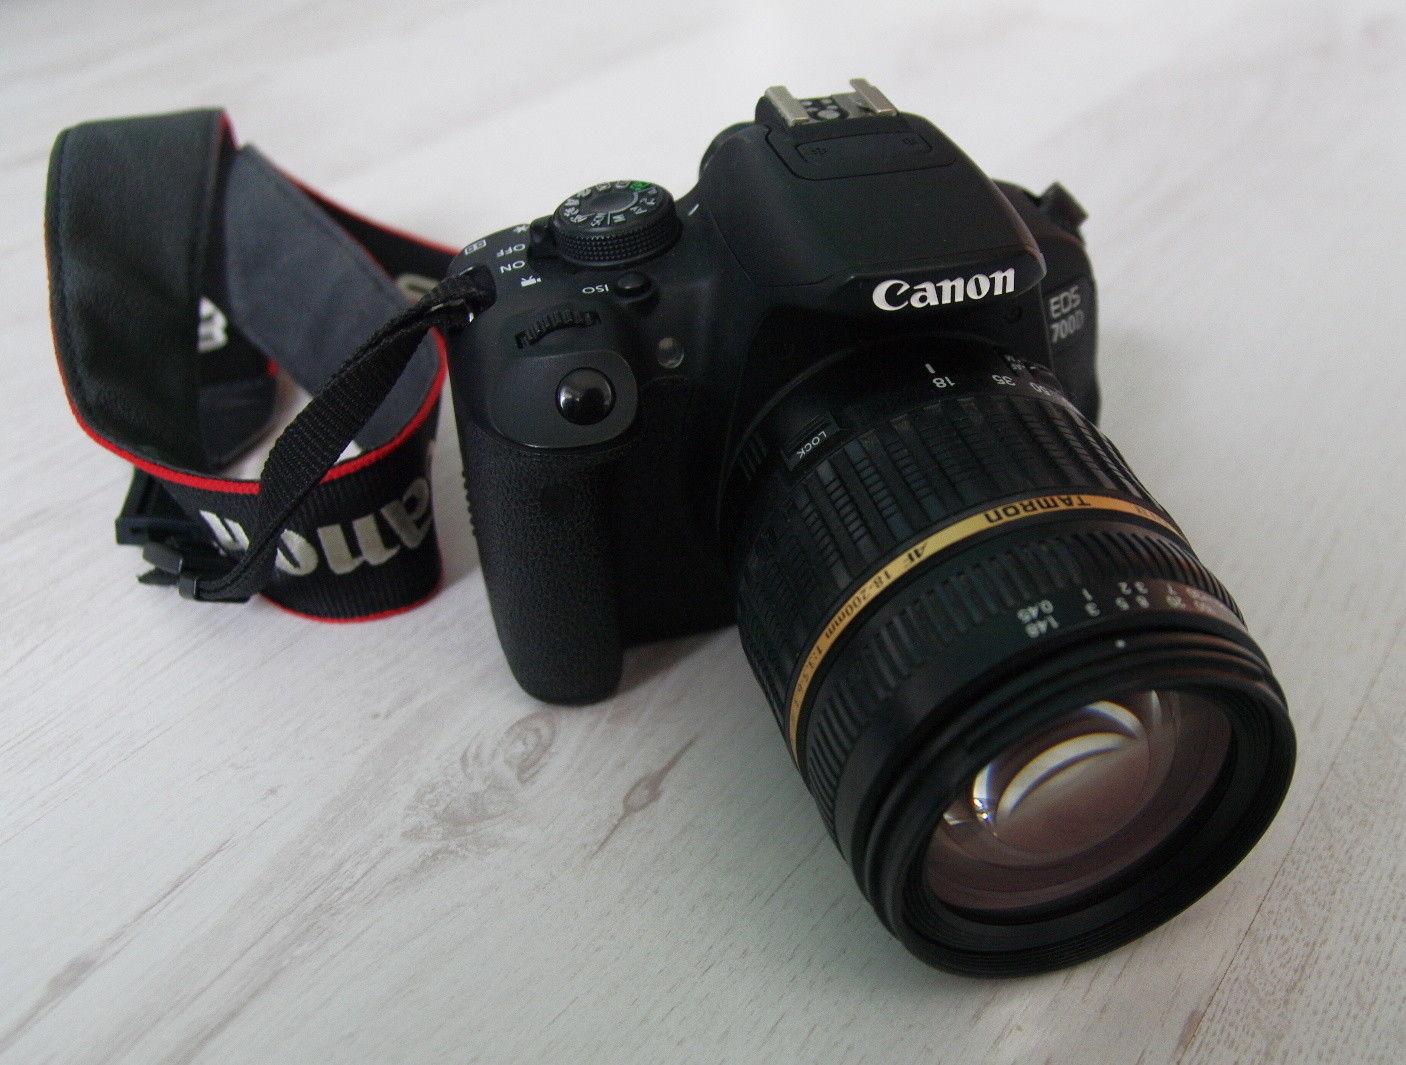 Canon EOS 700D mit Tamron 18-200mm Zoom DSLR Kamera